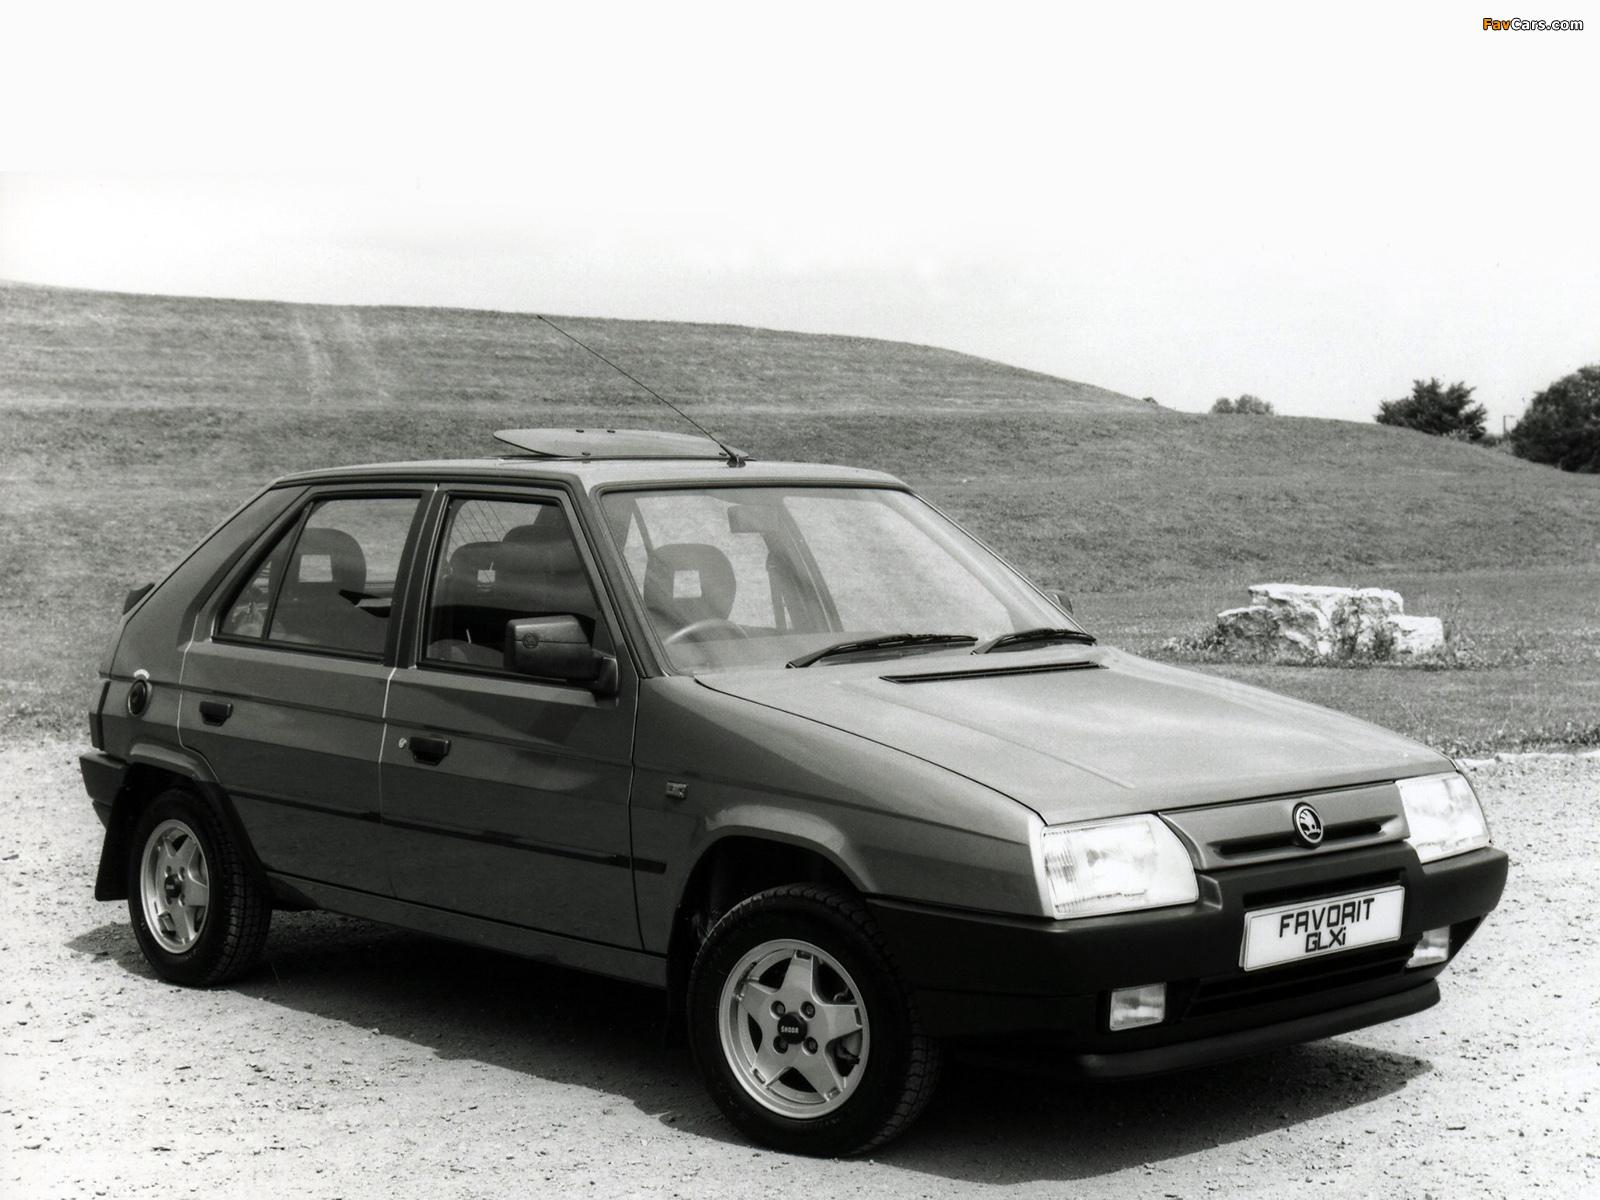 Škoda favorit ukspec type 781 1989�94 wallpapers